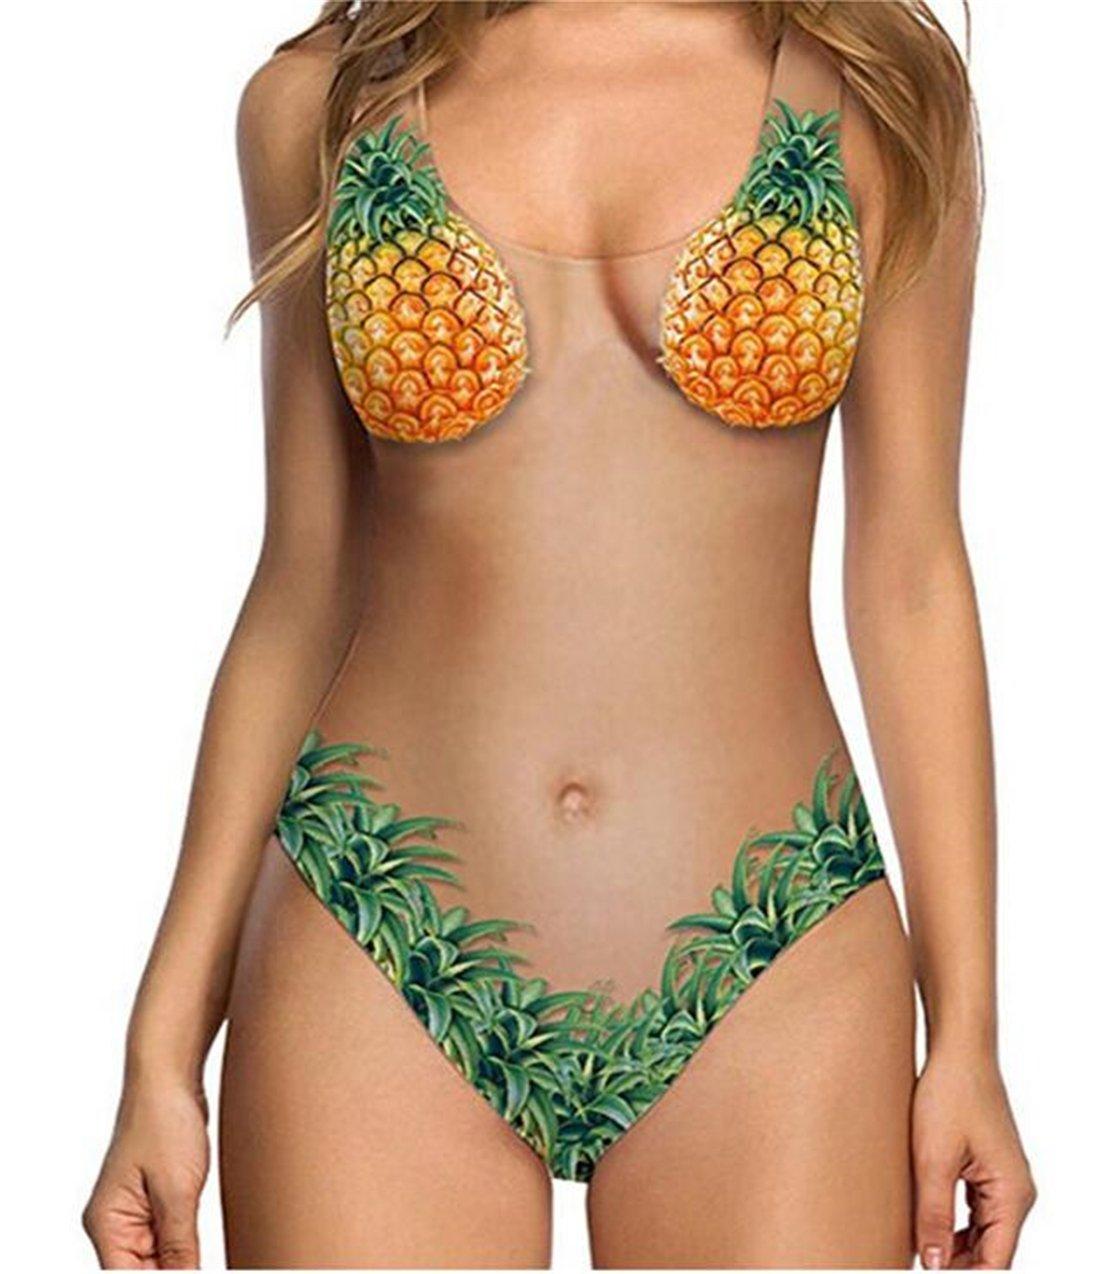 Tmrow 1 set Bikini Bathing Suit, Swimwear Pineapple Skin Color Bikini Swimsuit Female Swimsuit,XL by Tmrow (Image #1)